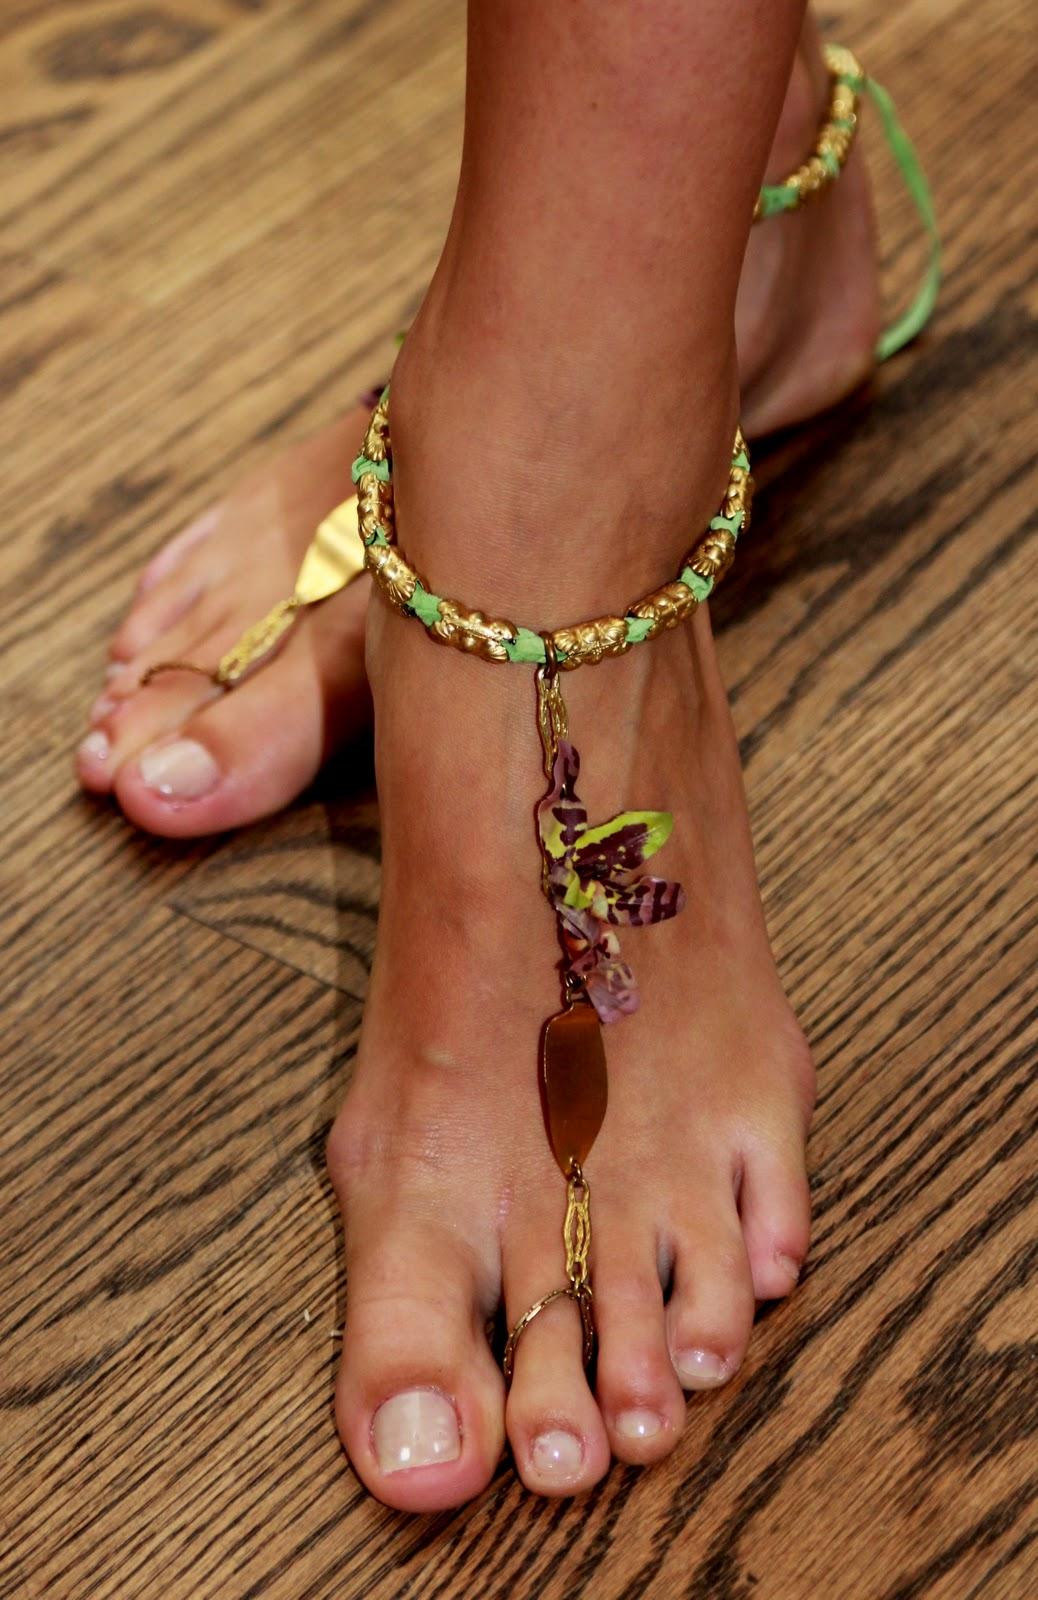 reid up Riley feet close